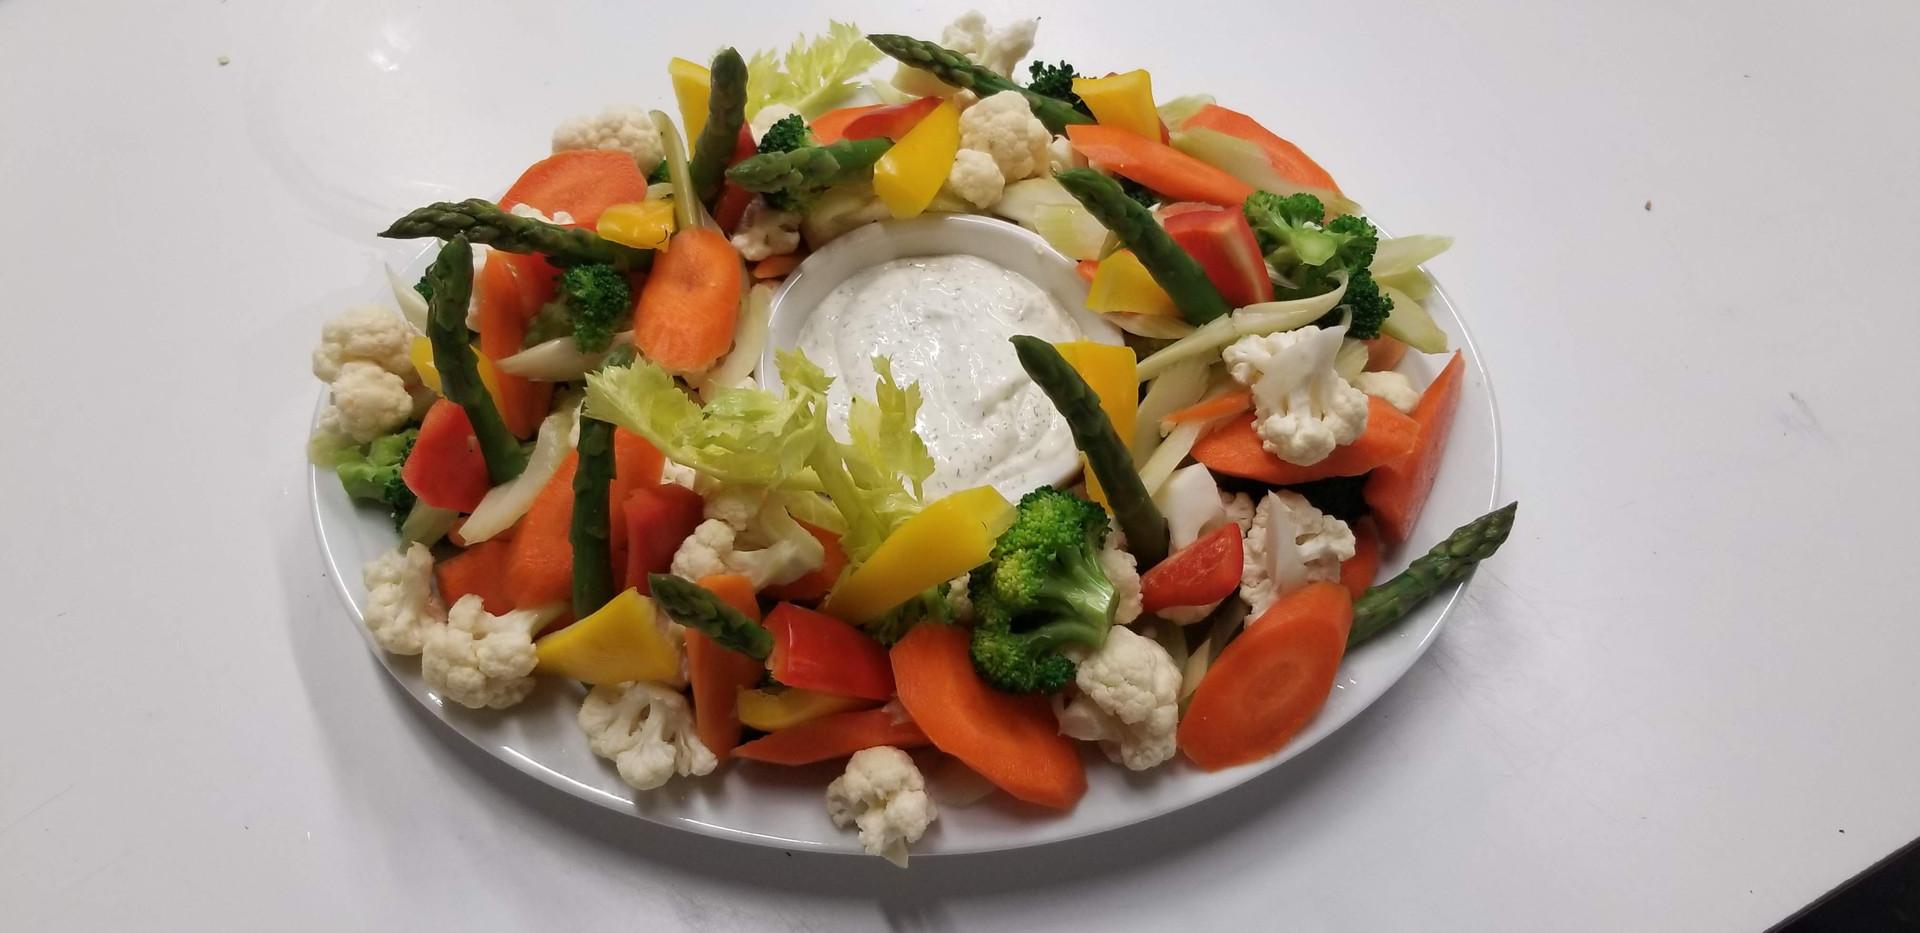 Vegetable Crudite